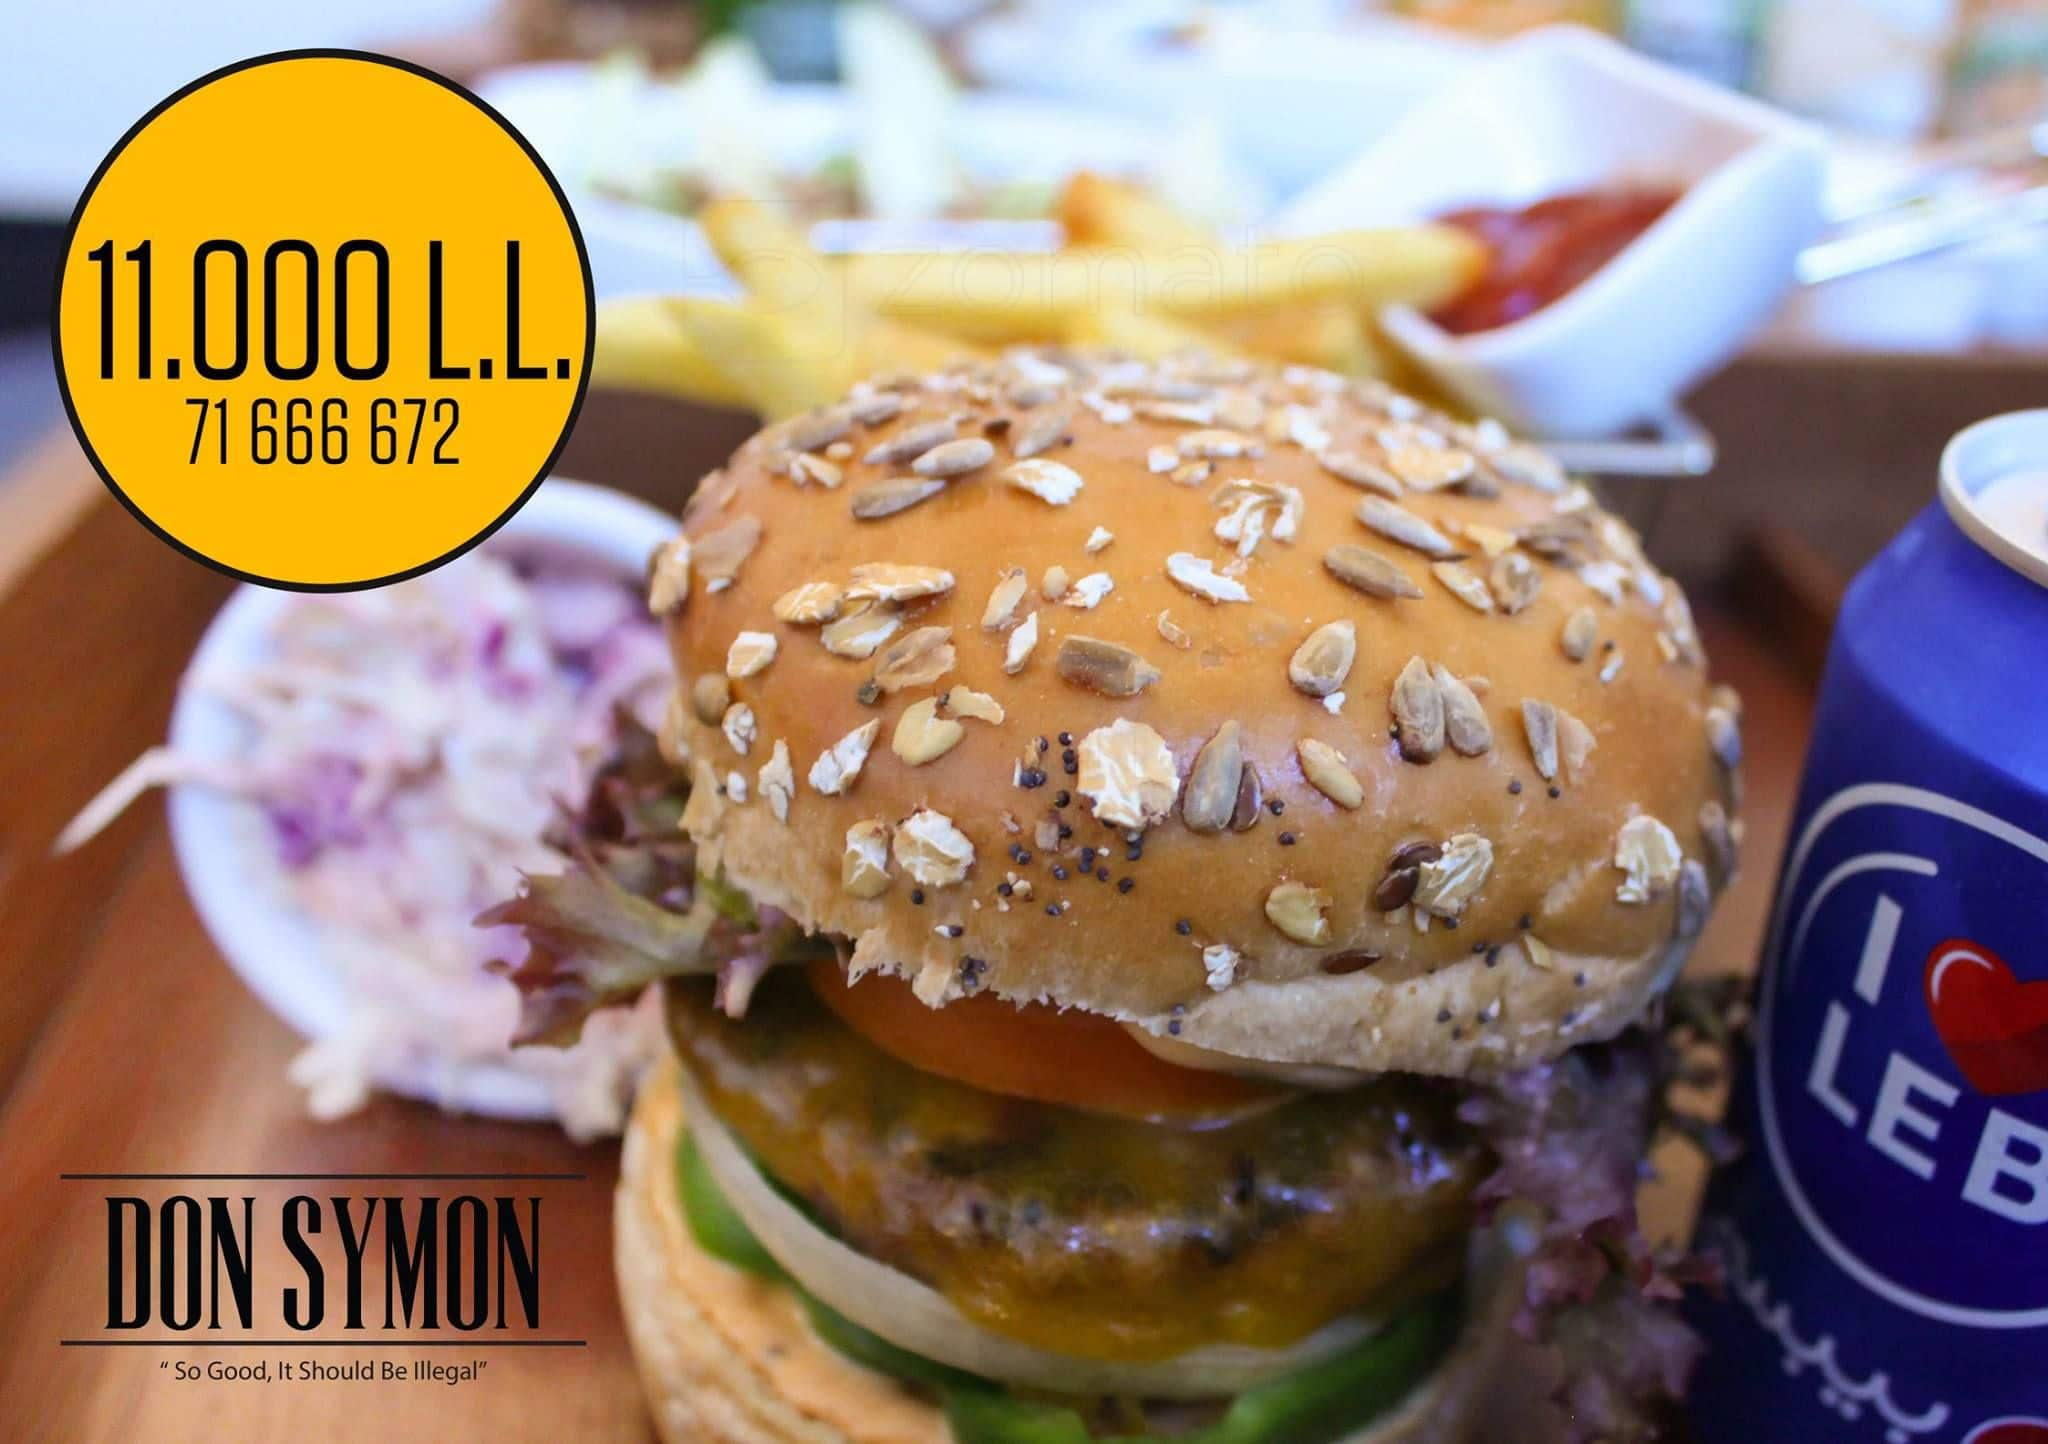 don symon kitchen pub menu zomato lebanon